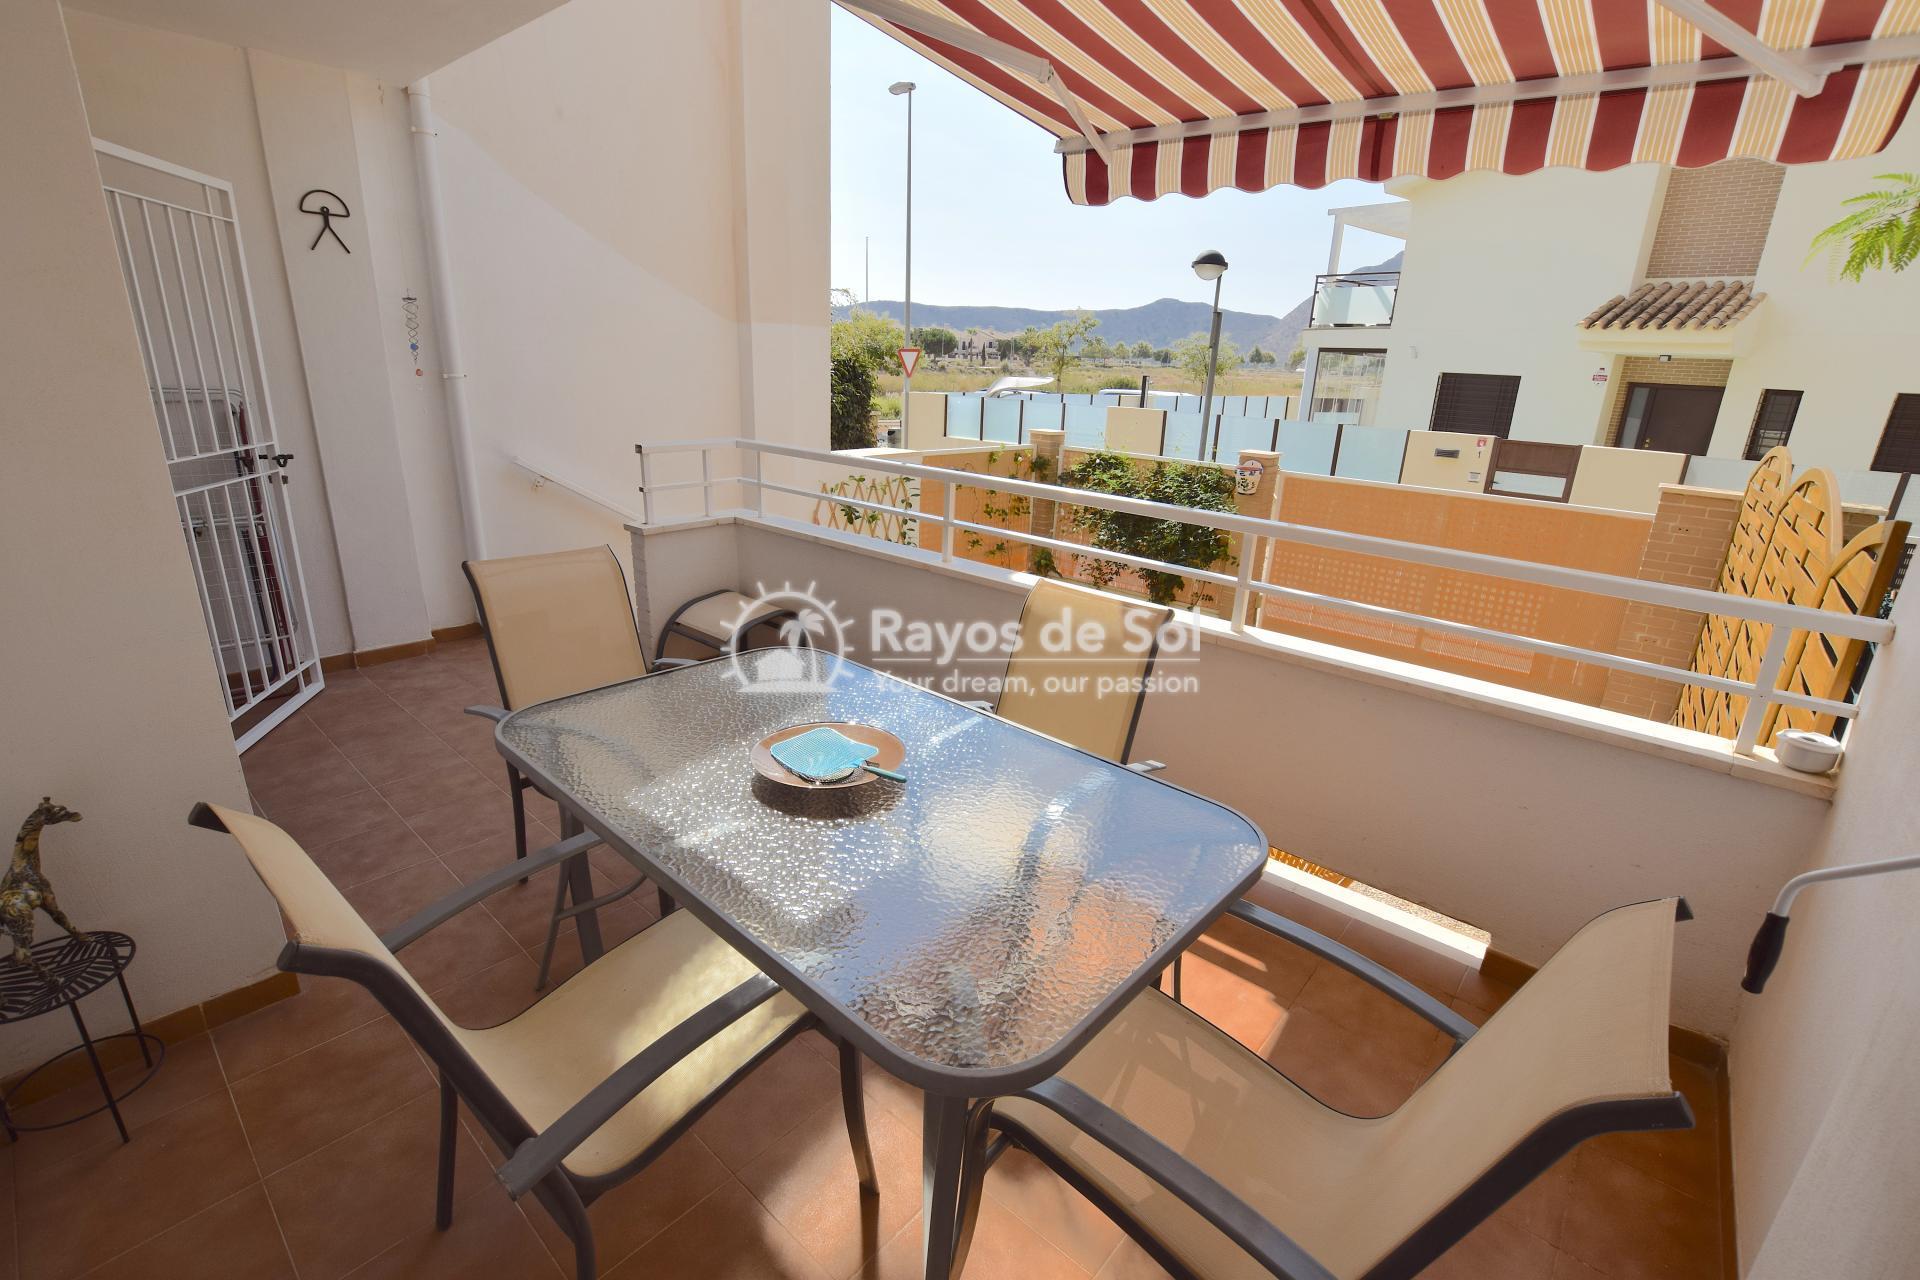 Appartement met zuidwest oriëntatie  in San Cayetano, Costa Cálida (SCRE0055) - 21